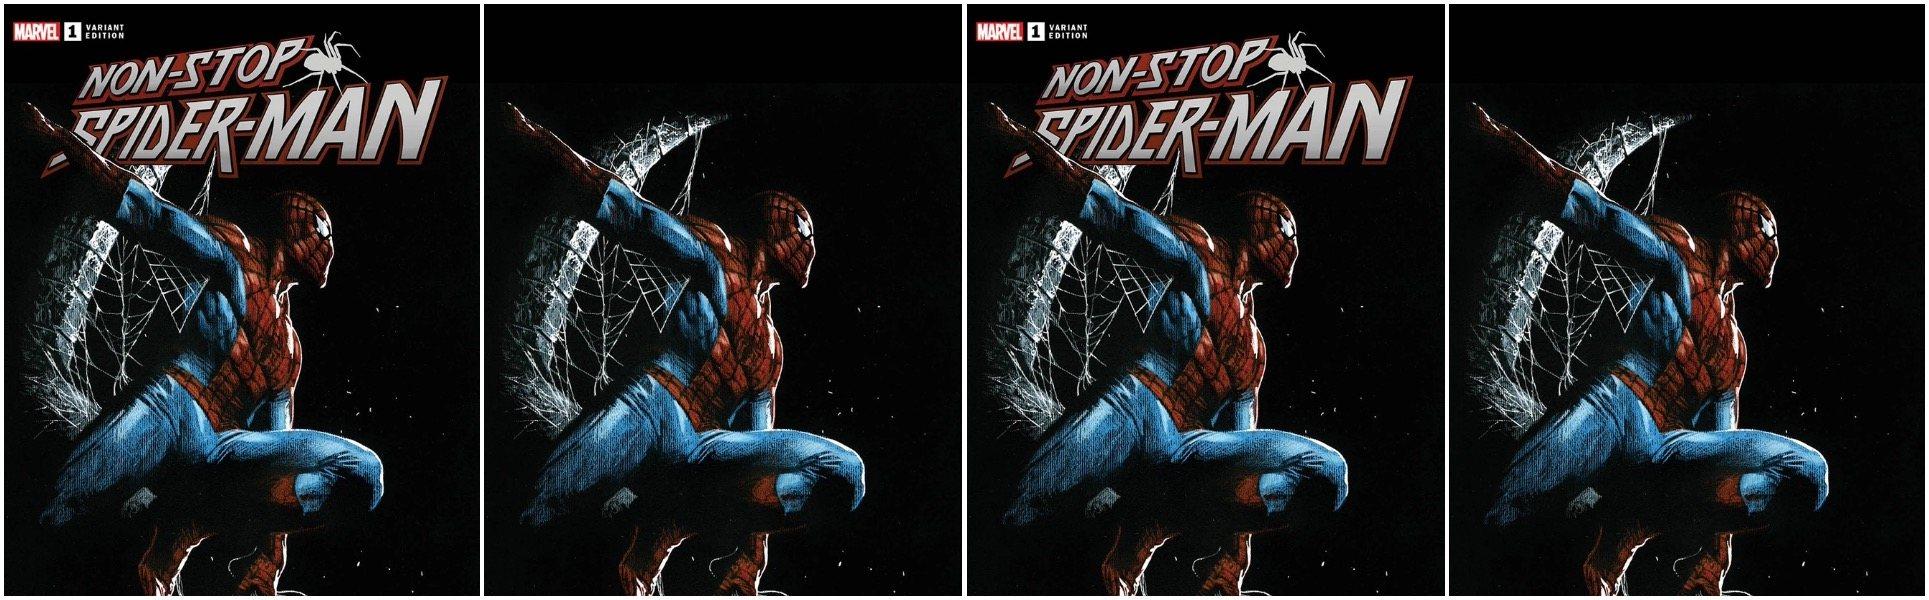 Non-Stop Spider-Man #1 Gabriele Dell'Otto Variants